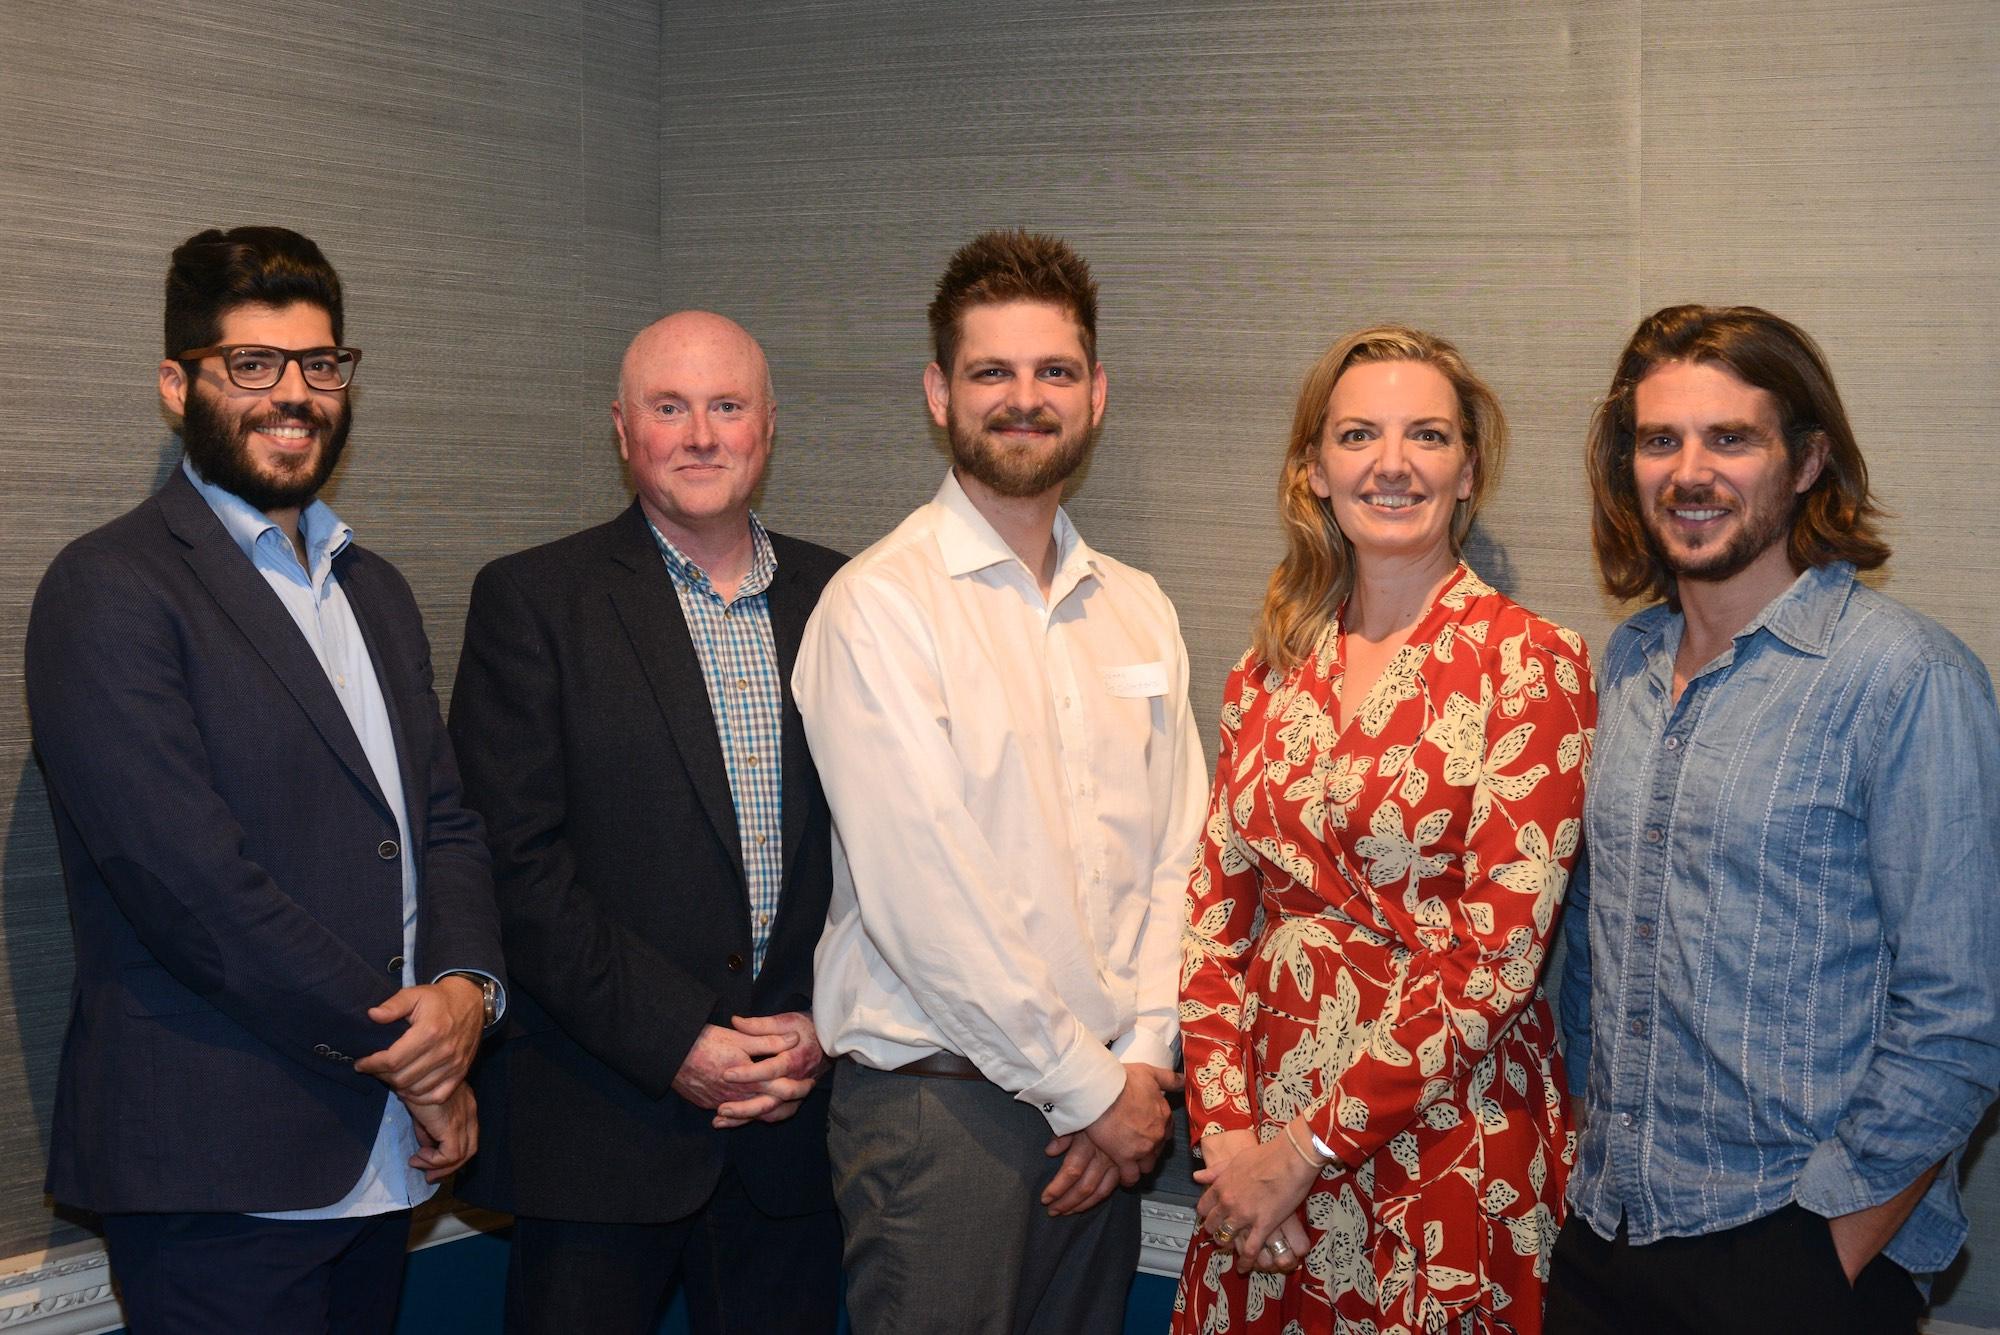 Blue Patch sustainable business awards, UK